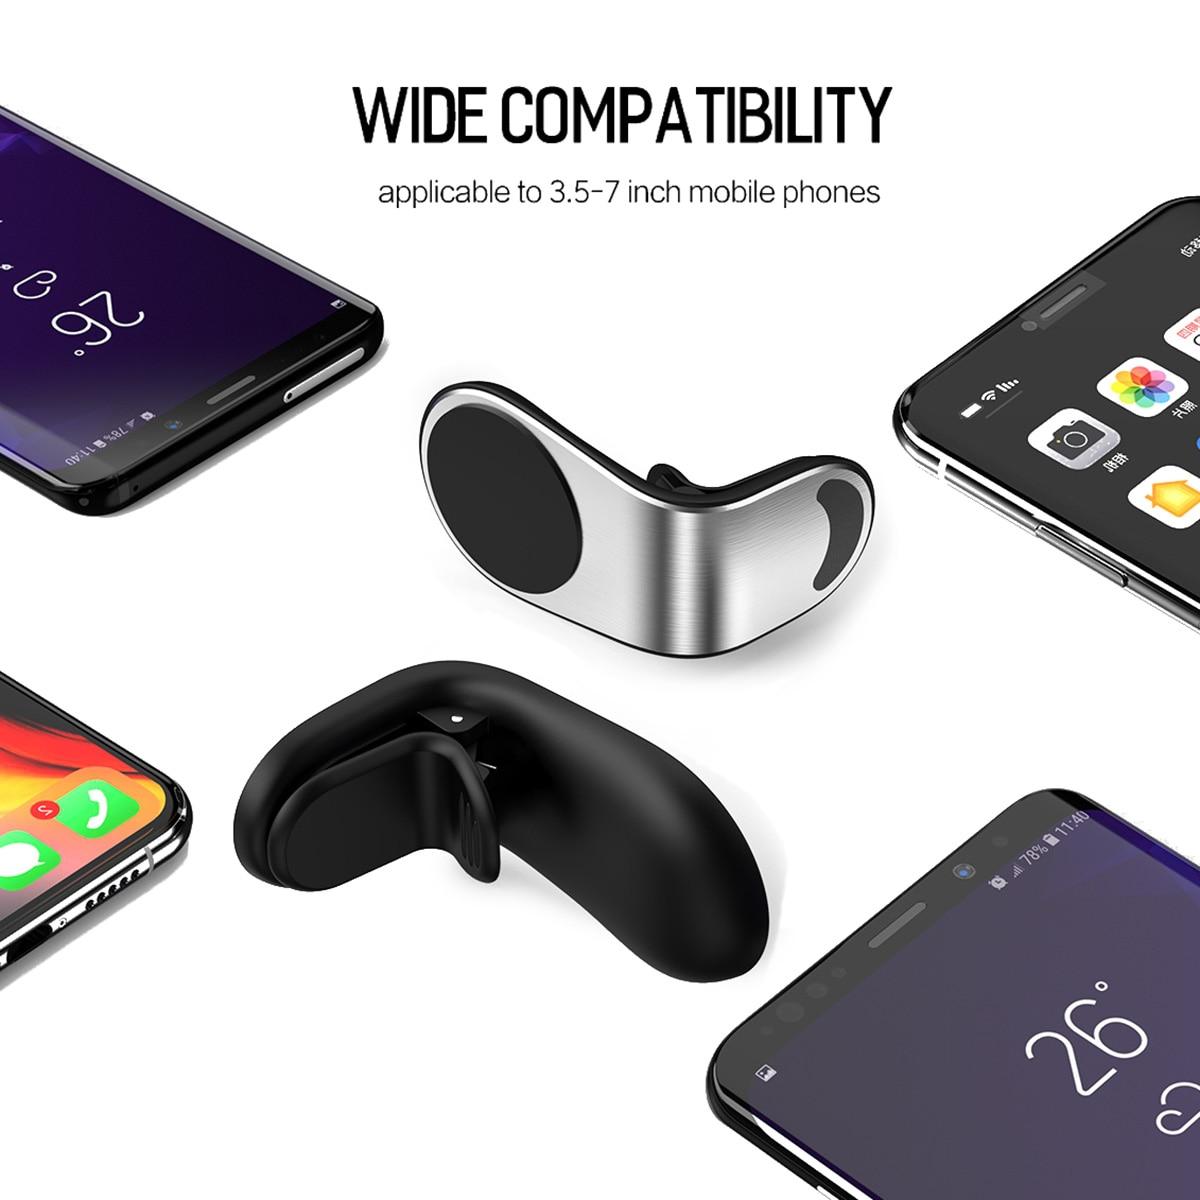 HTB1DpZUX3aH3KVjSZFjq6AFWpXaL - Minimalist Magnetic Car Phone Holder